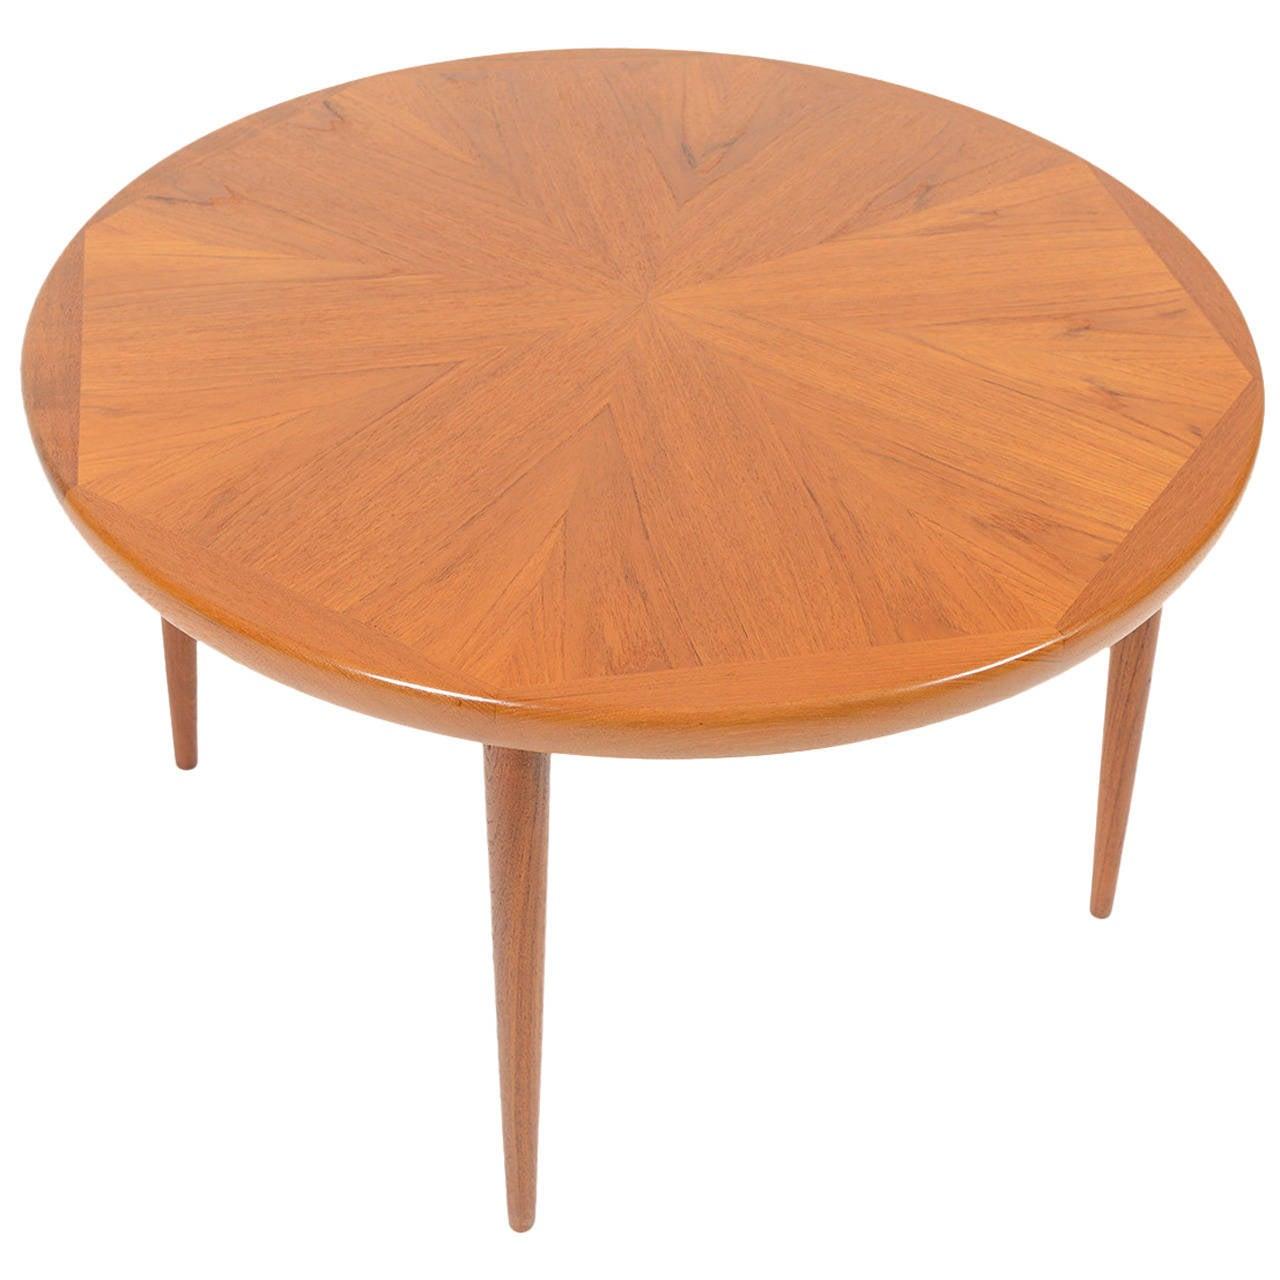 Starburst Round Coffee Table in Teak by Spottrup Mbelfabrik For